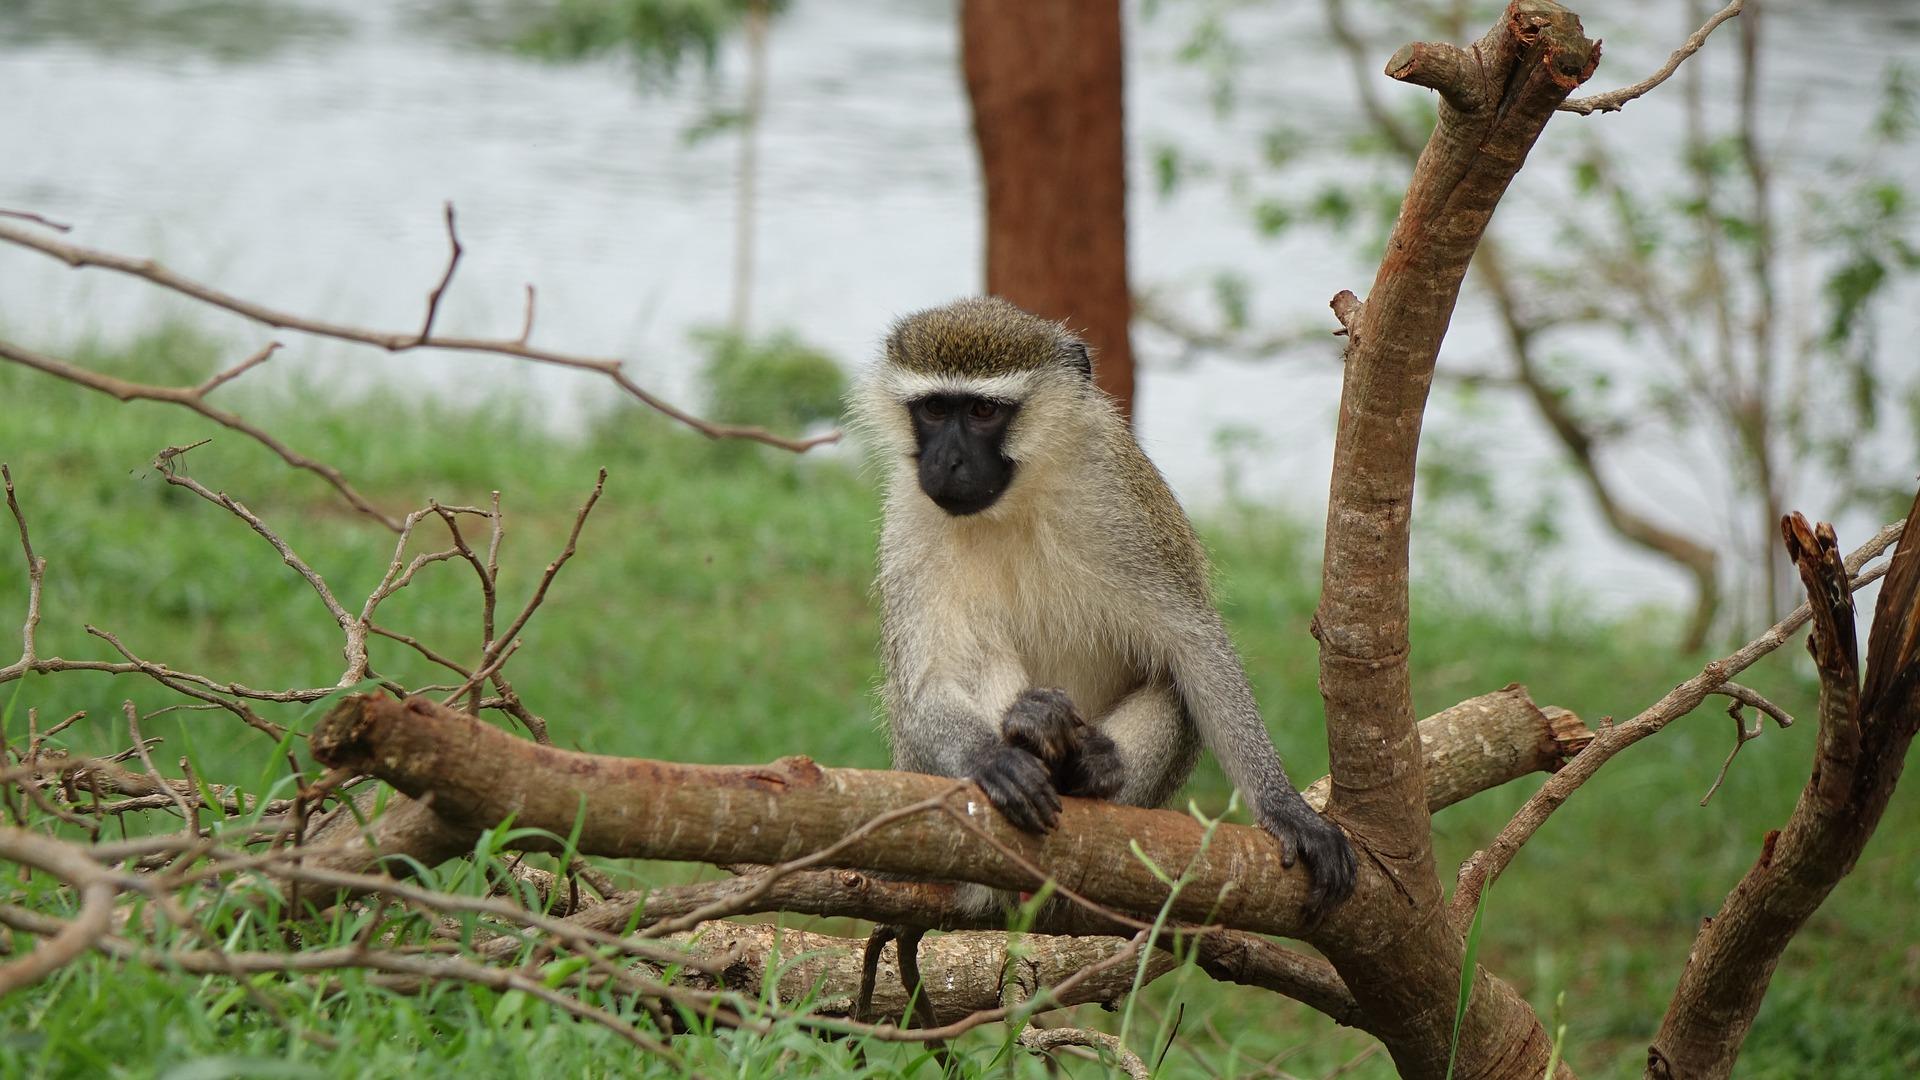 Monkey in Small Tree